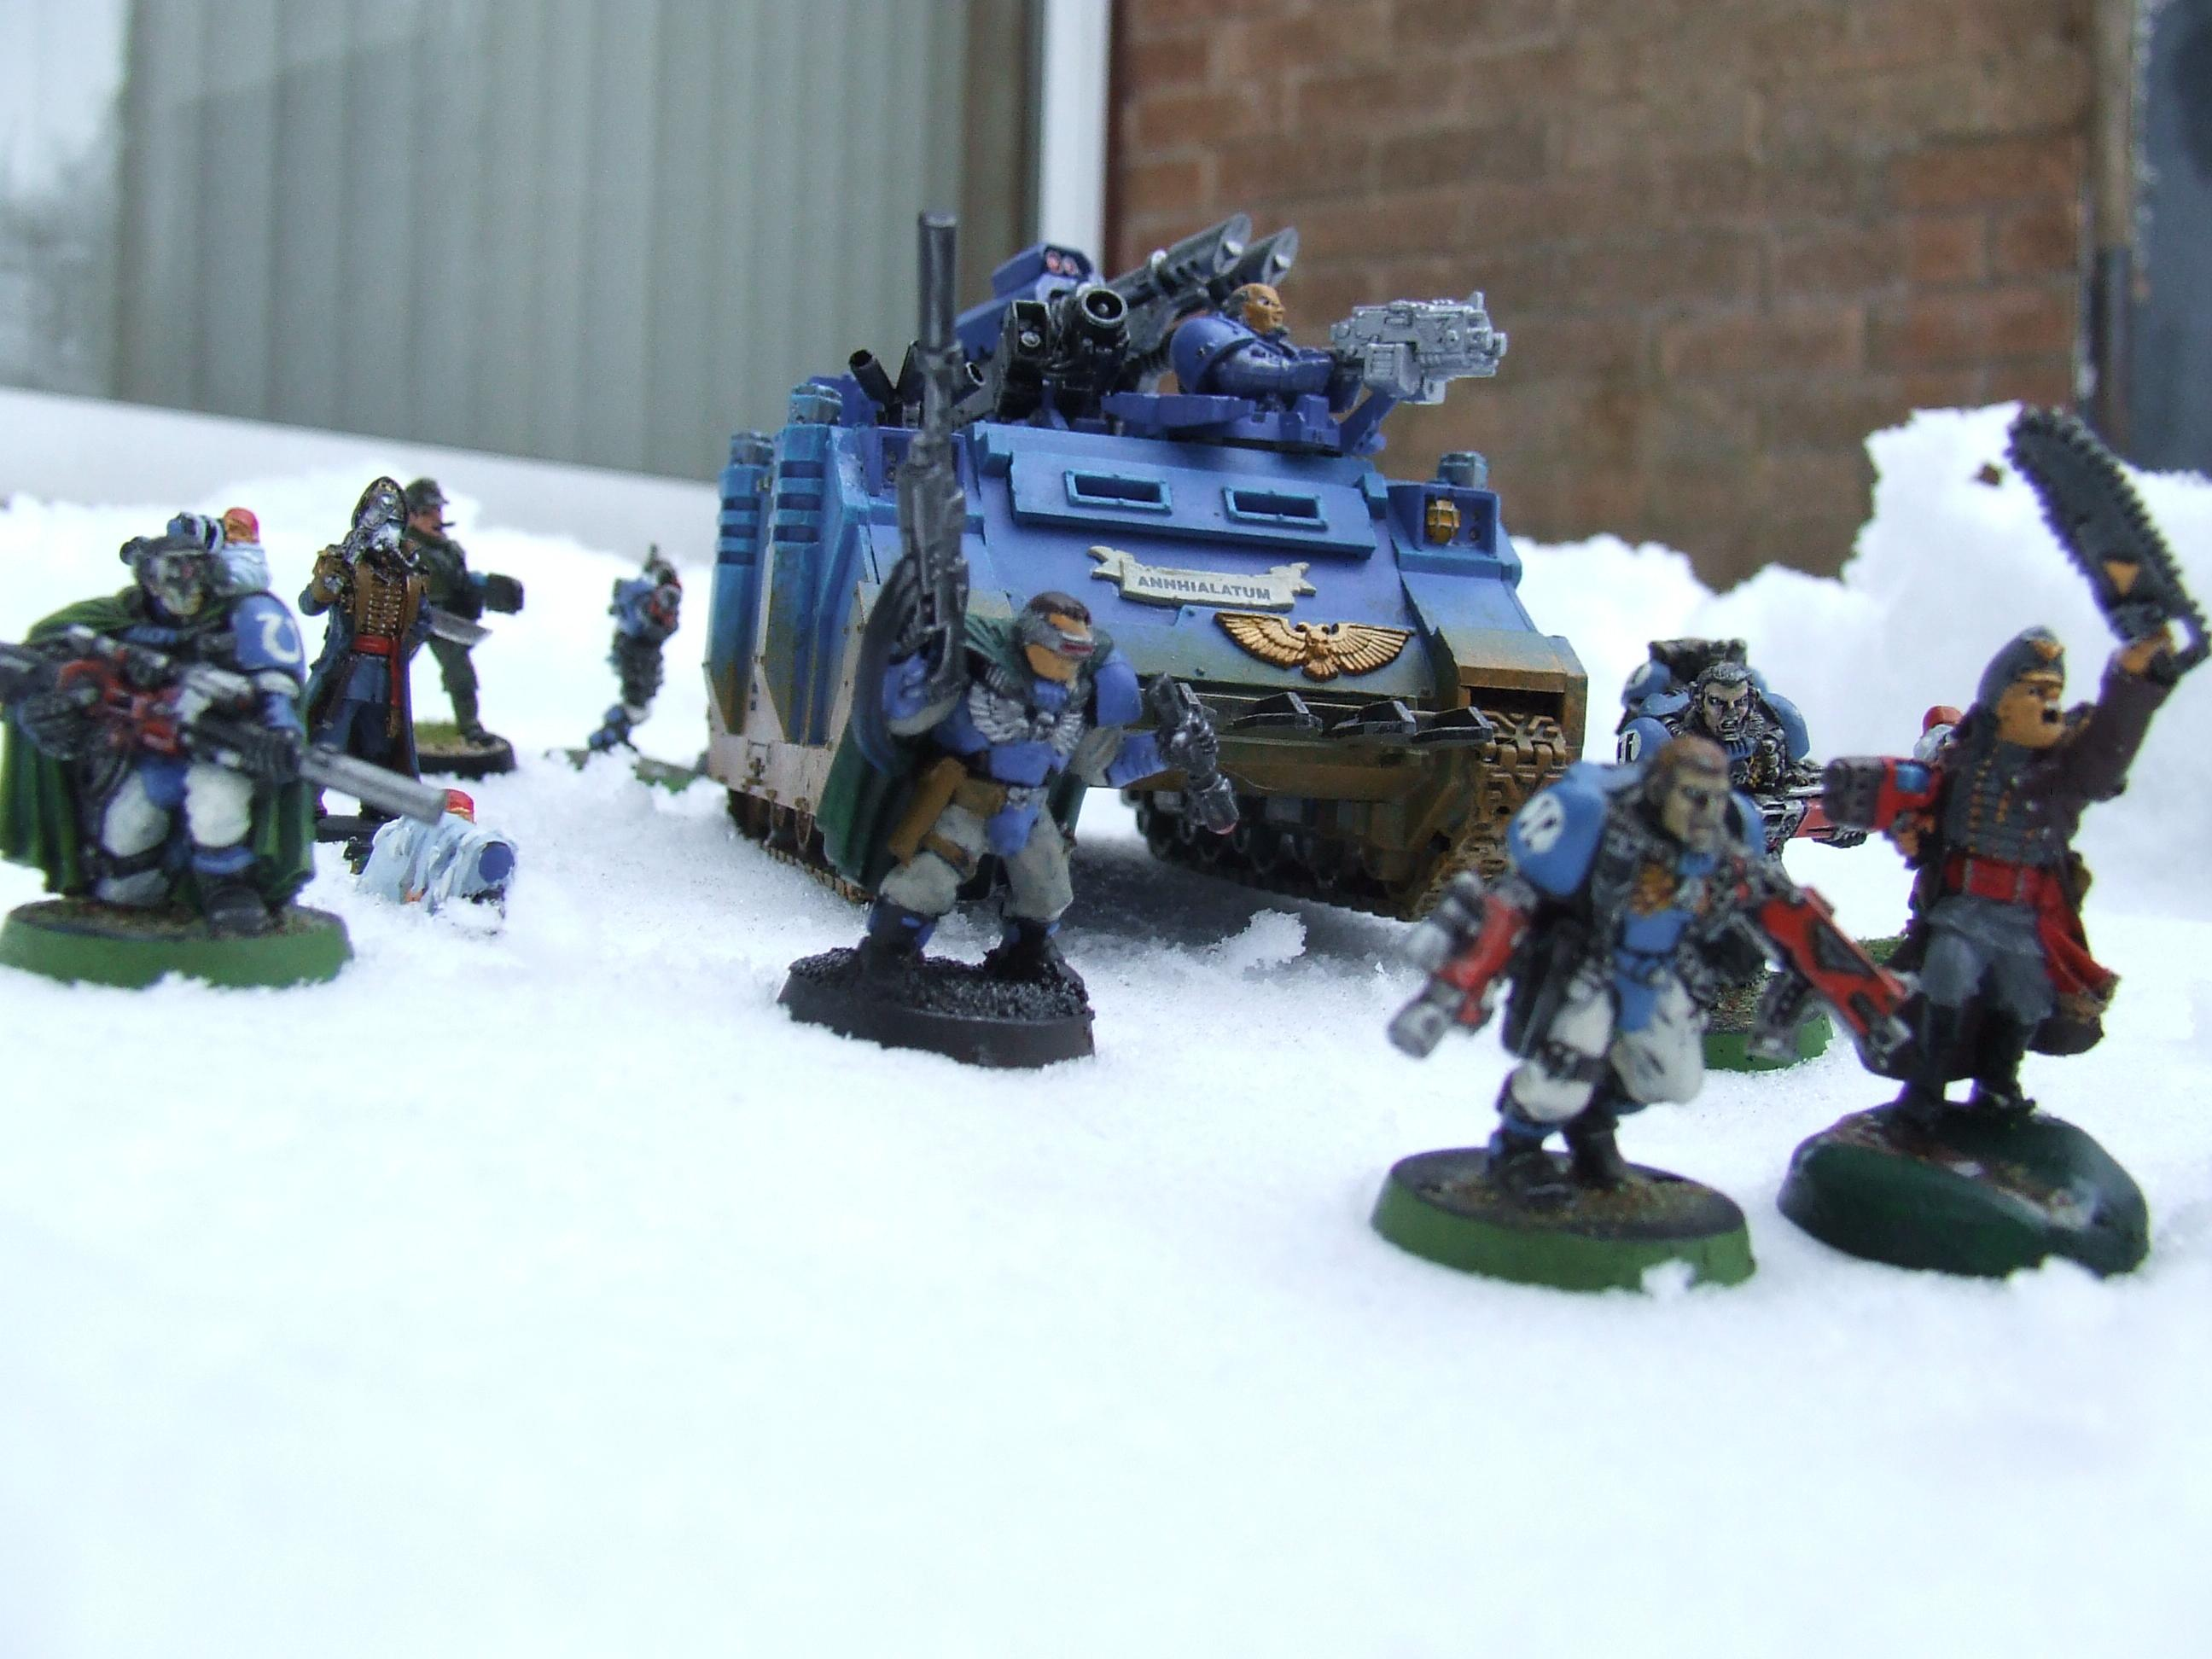 Imperial Guard, Rhino, Snow, Space Marines, Ultramarines